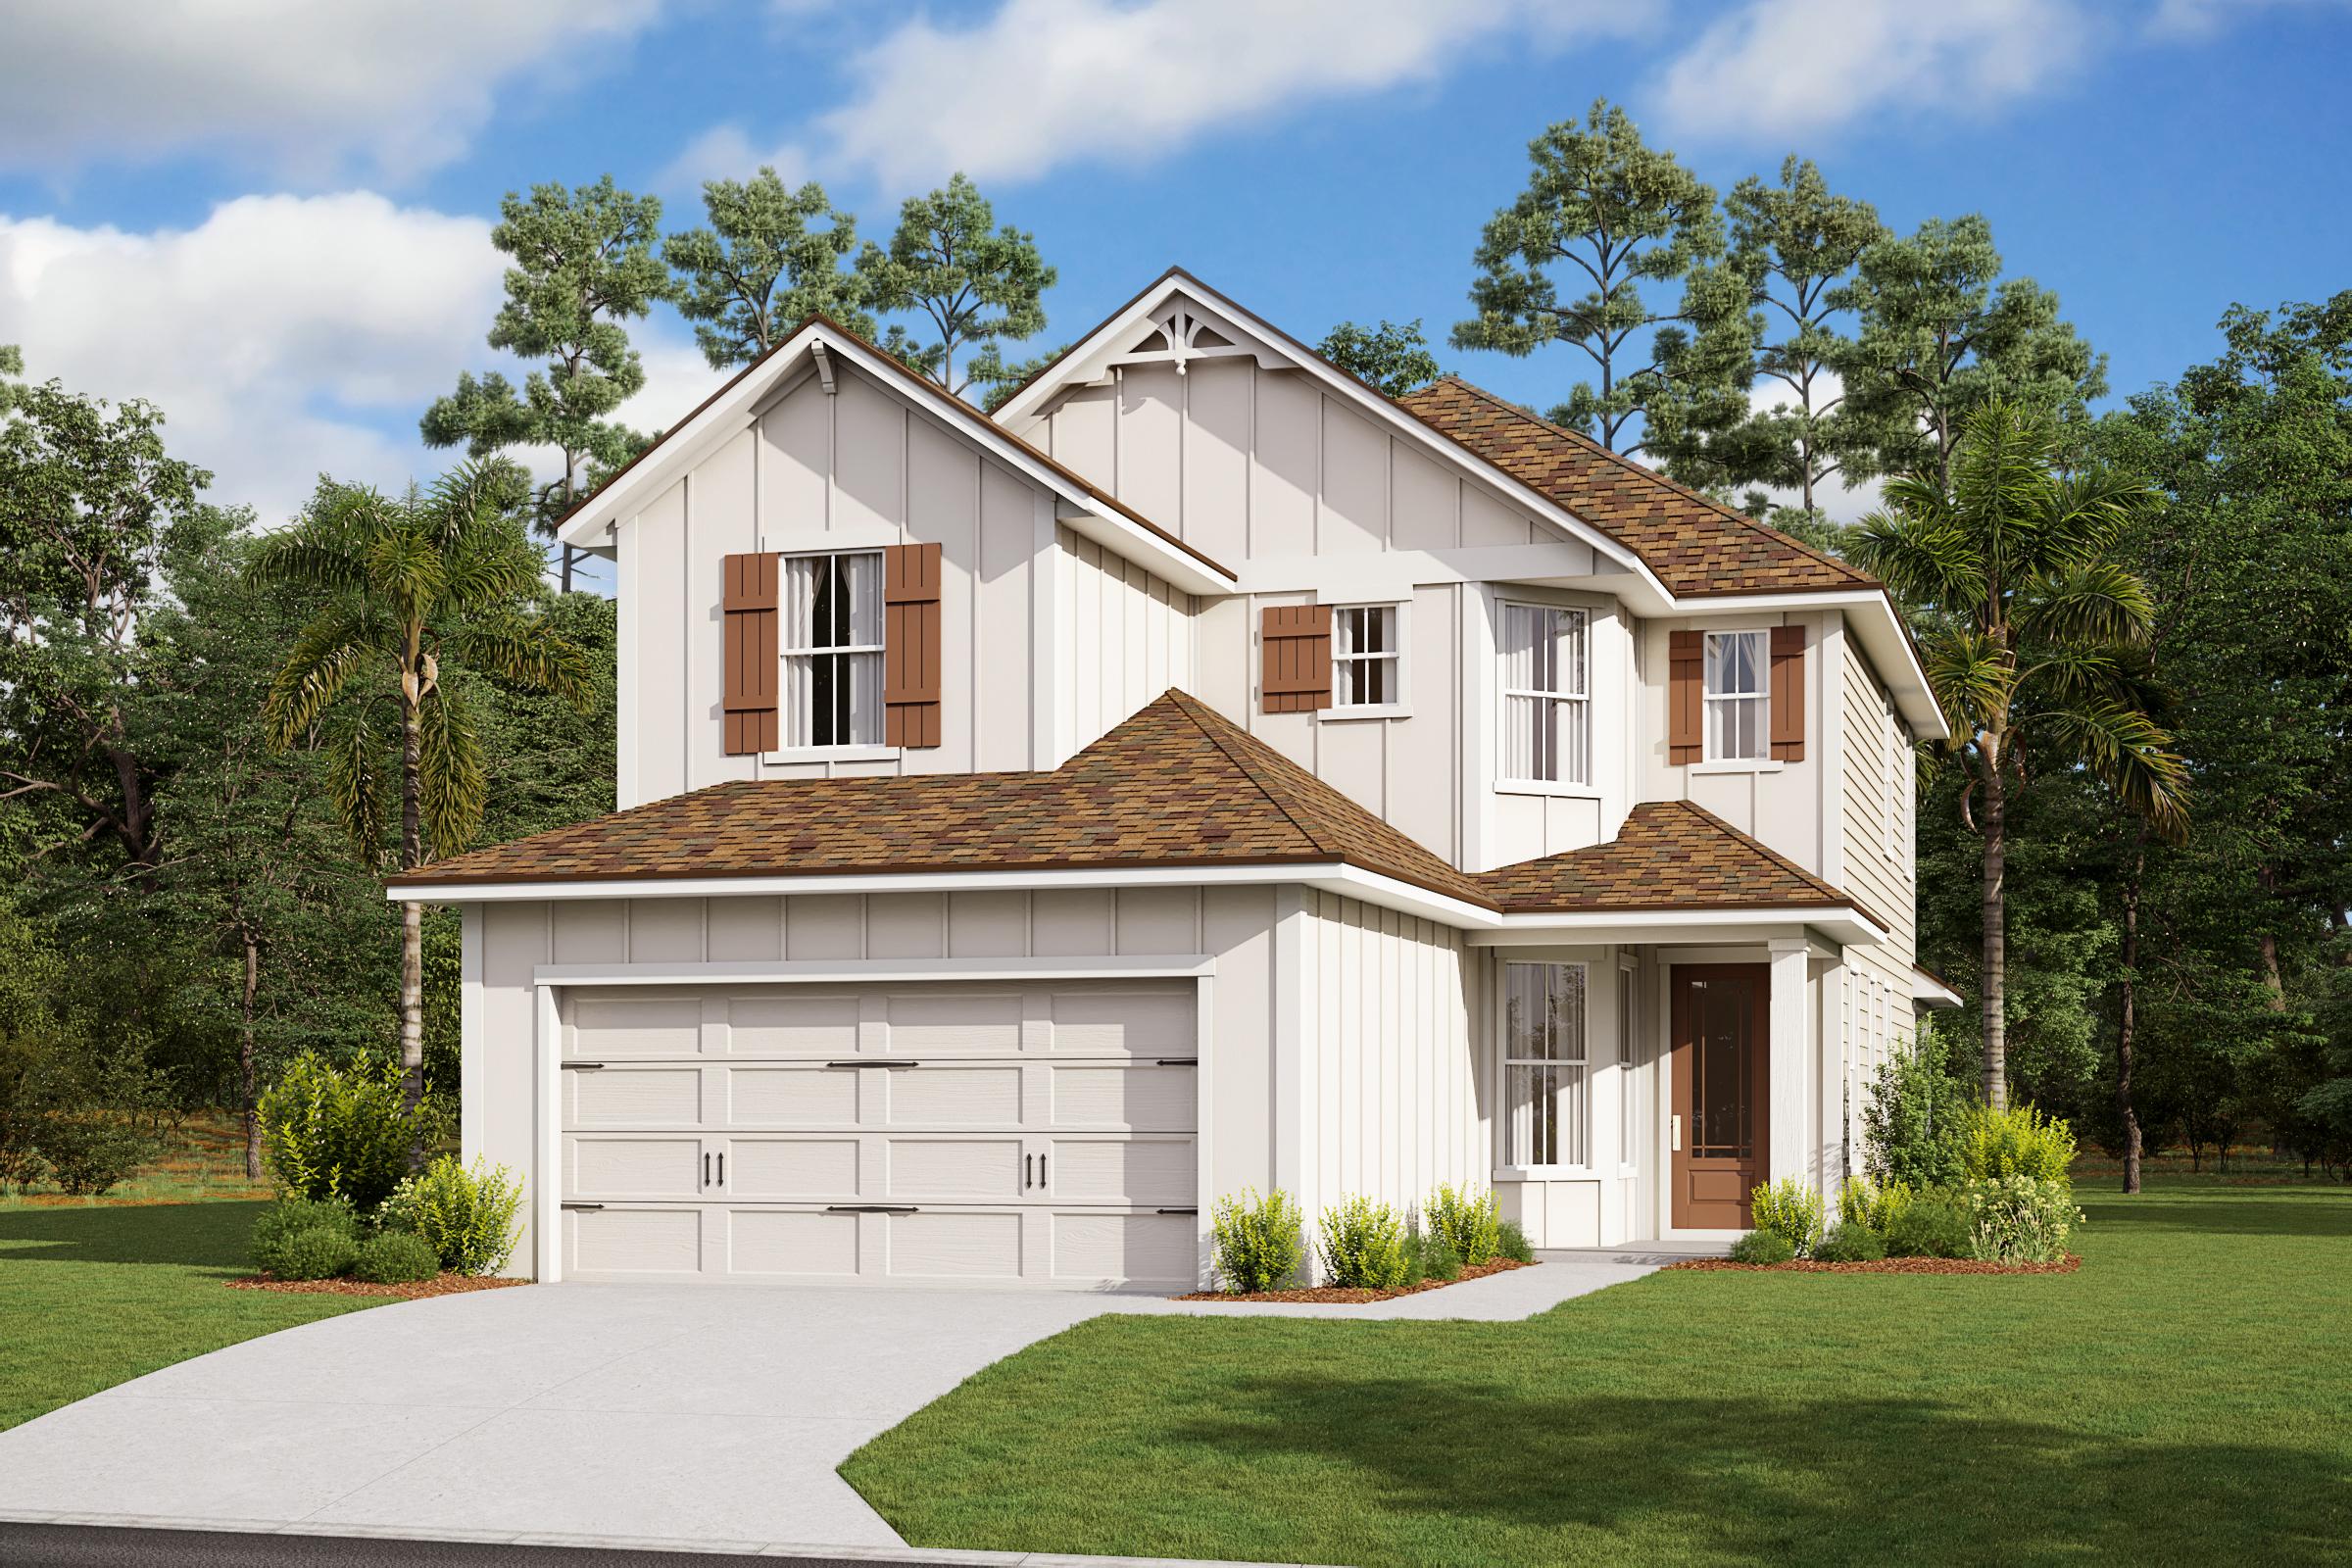 Juniper-Florida Farmhouse-Elevation